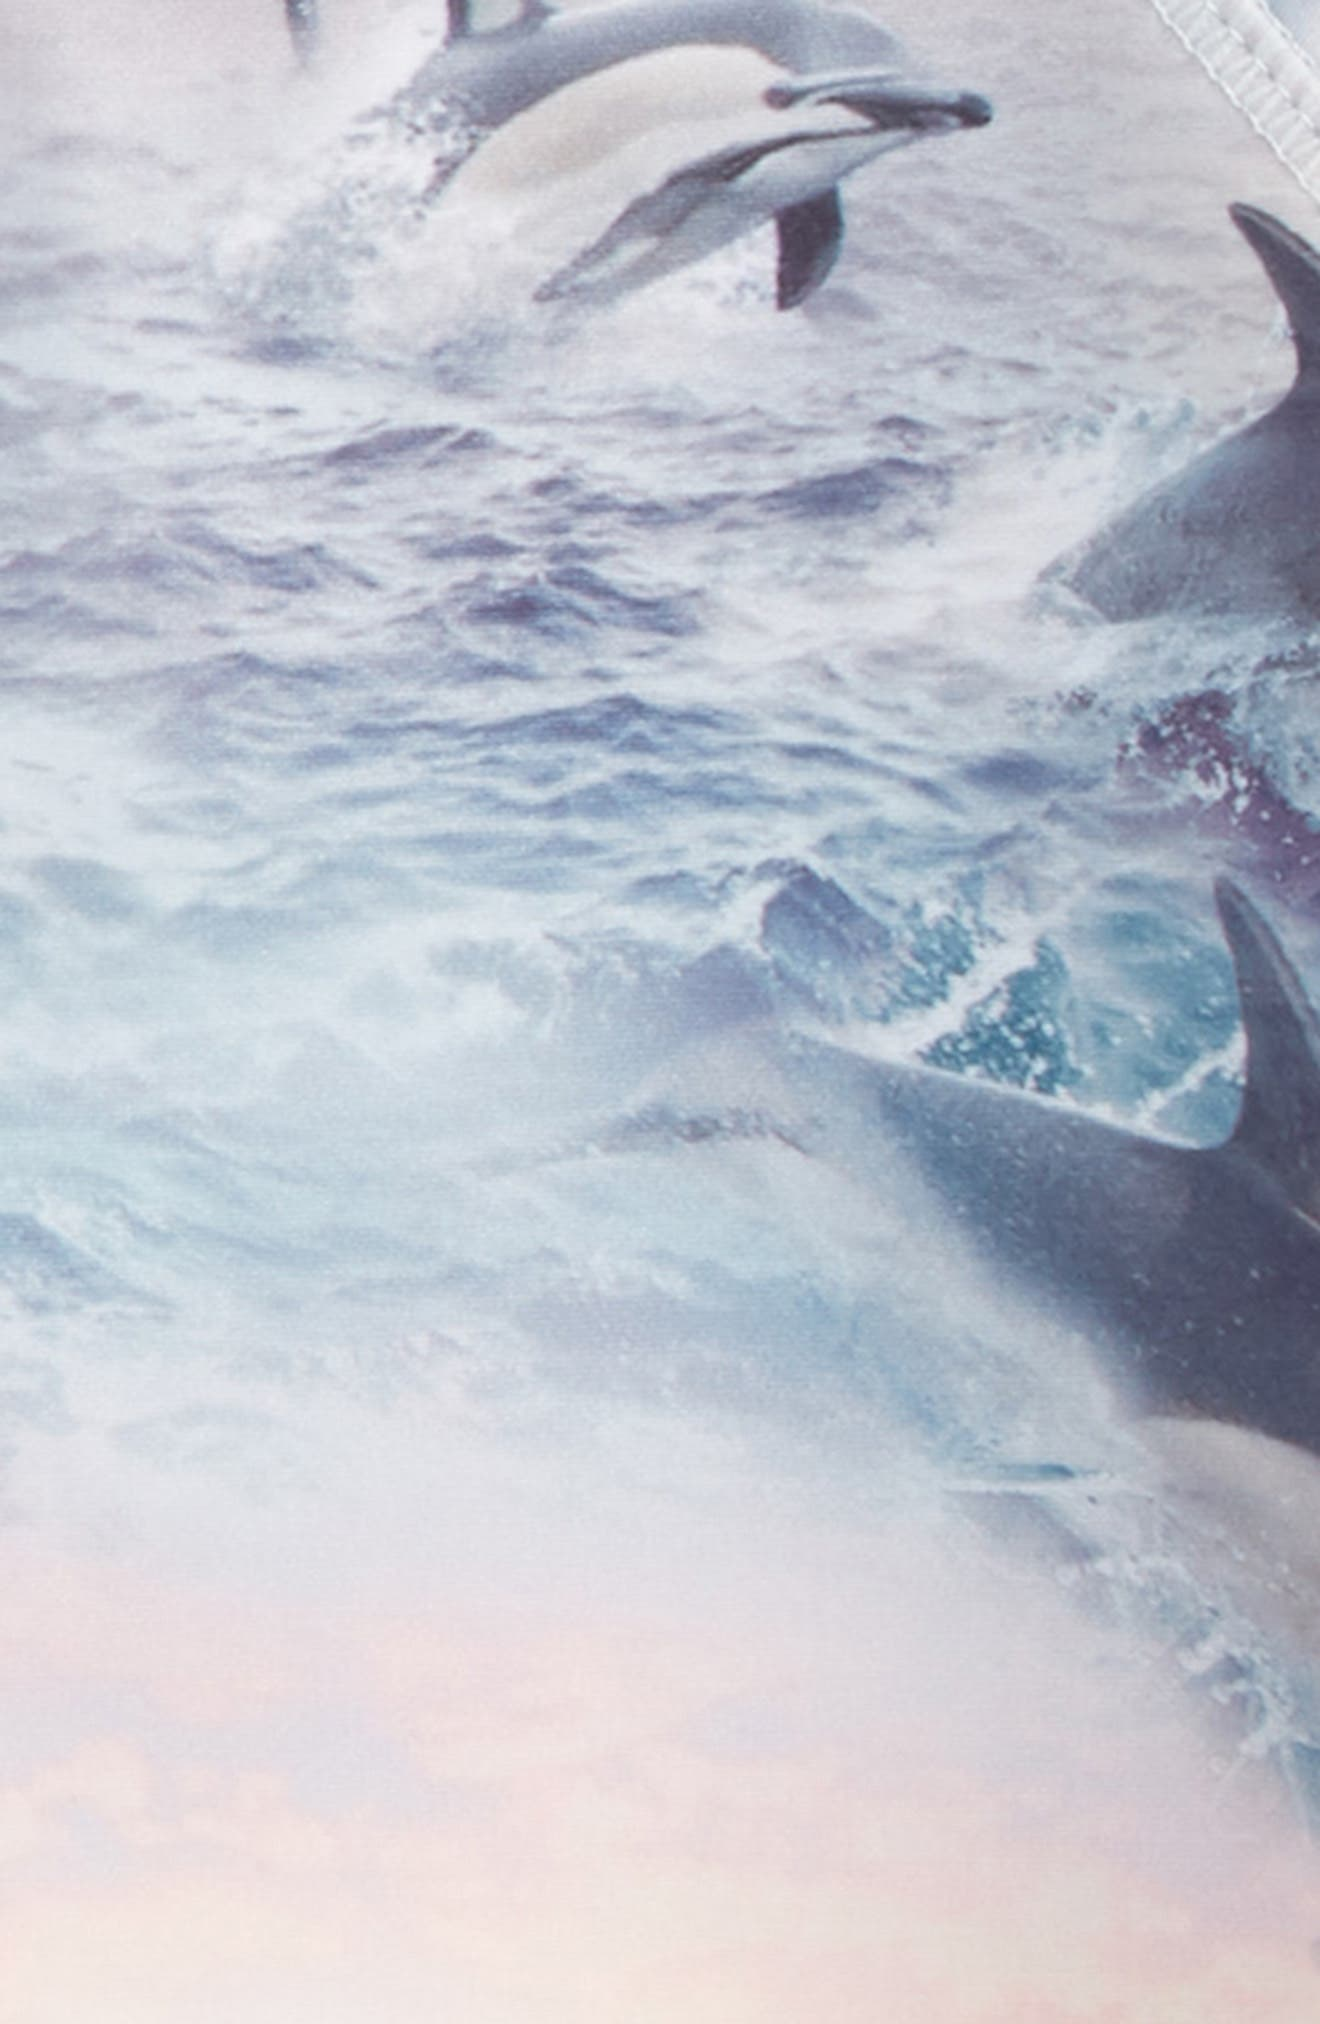 Neptune Short Sleeve Rashguard,                             Alternate thumbnail 2, color,                             Dolphins Sunset